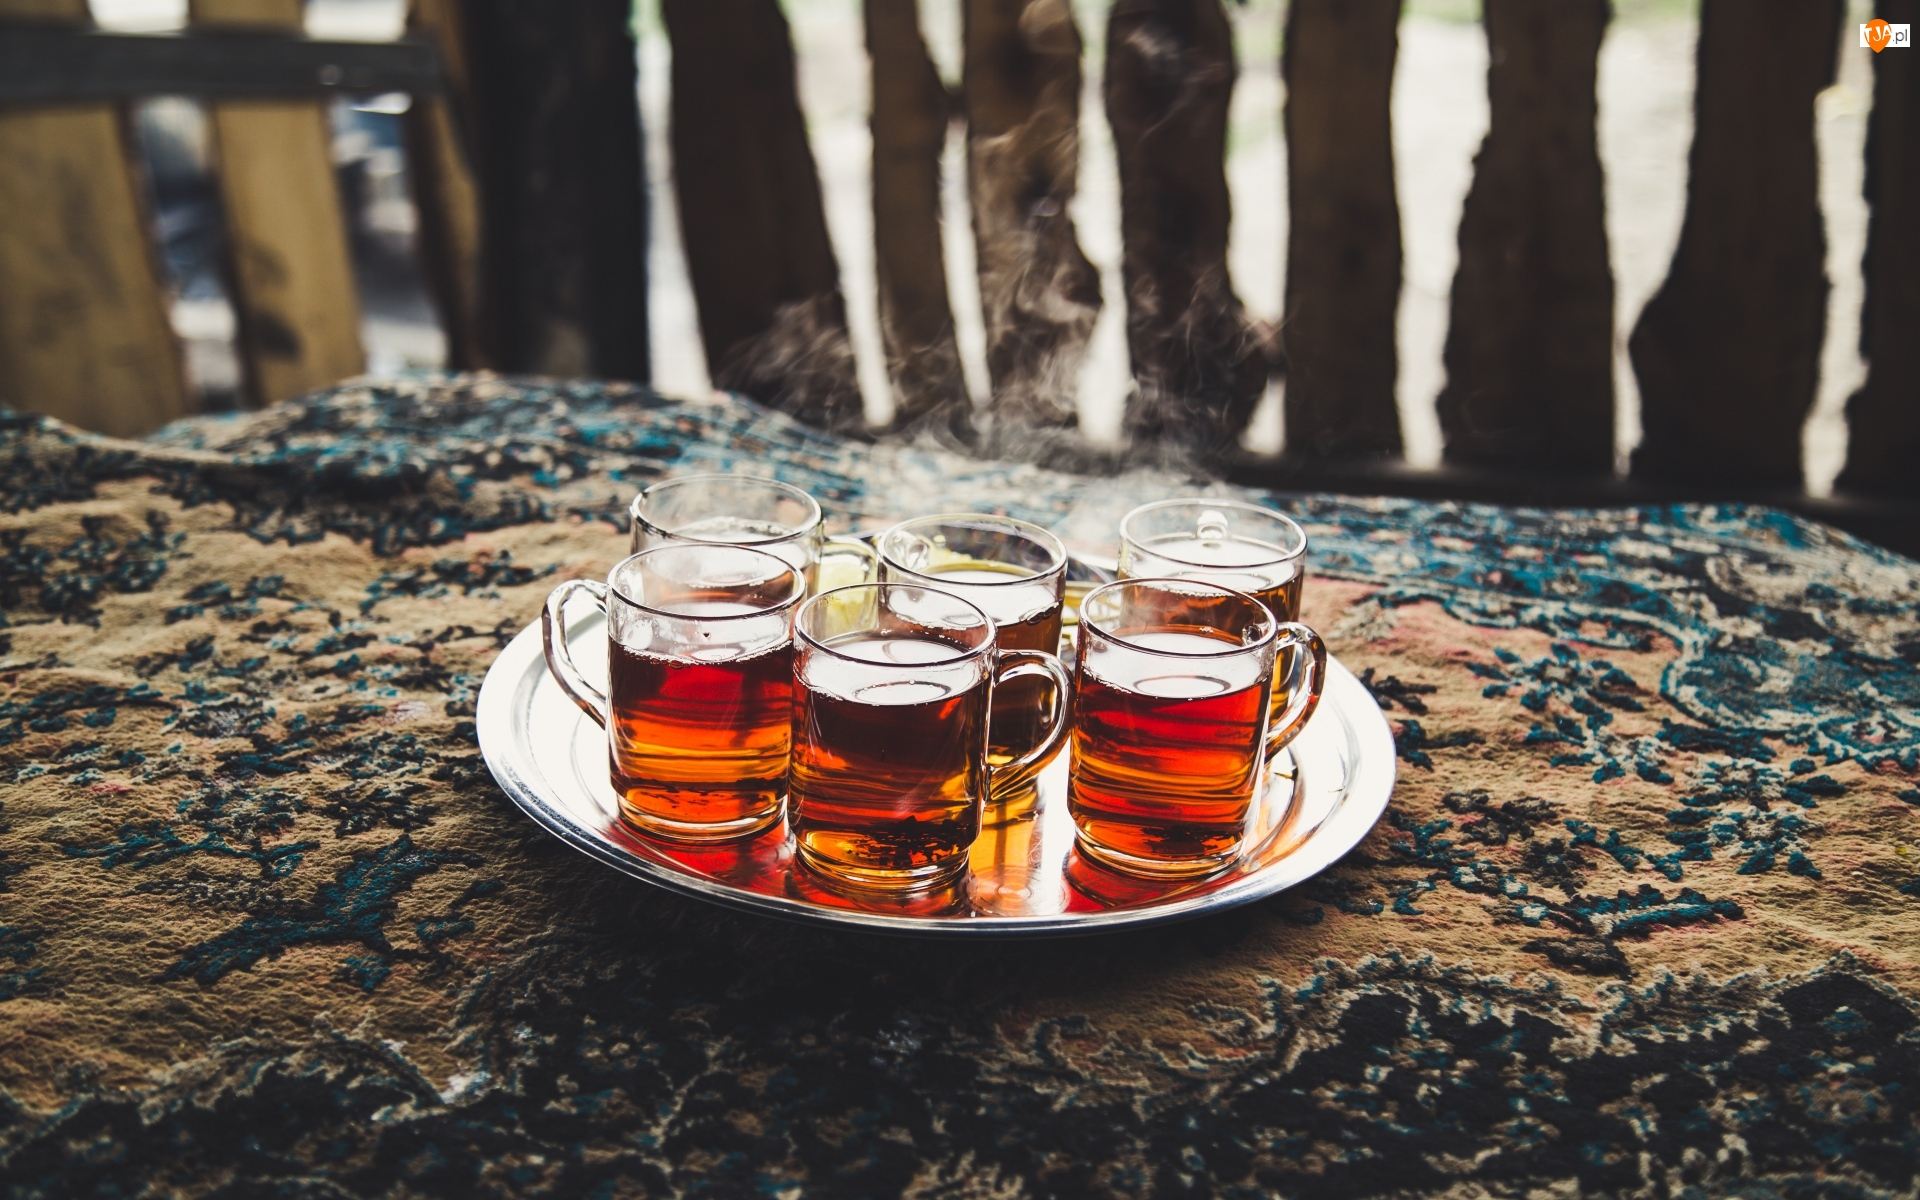 Szklanki, Taca, Herbata, Para